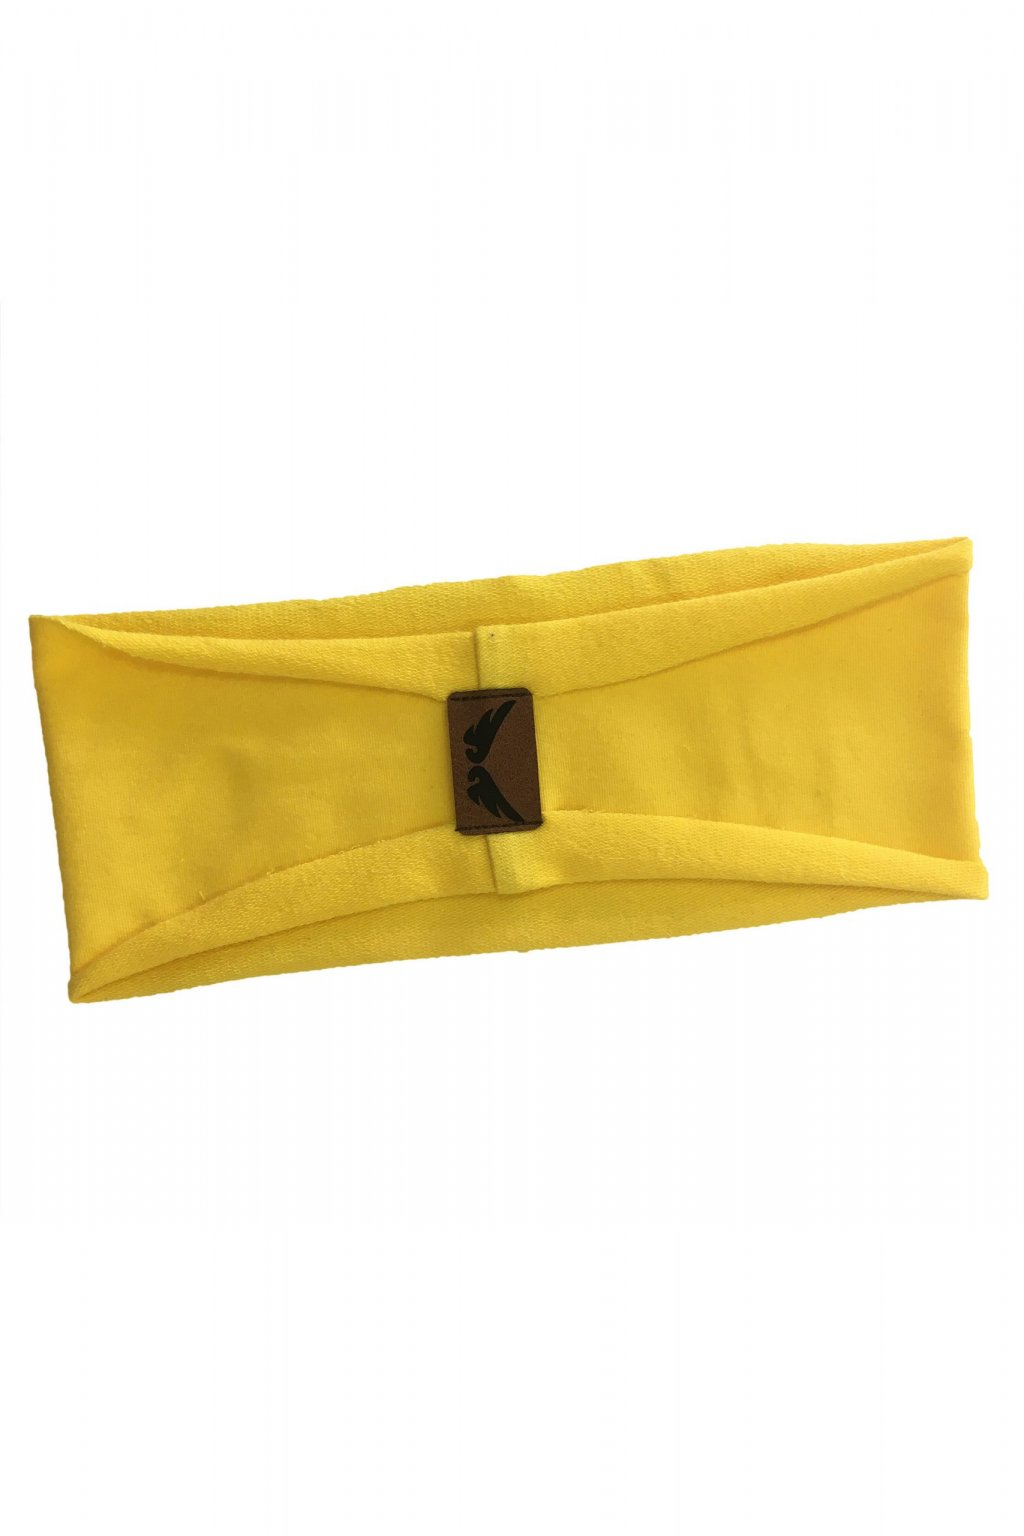 Čelenka Filii (žltá)